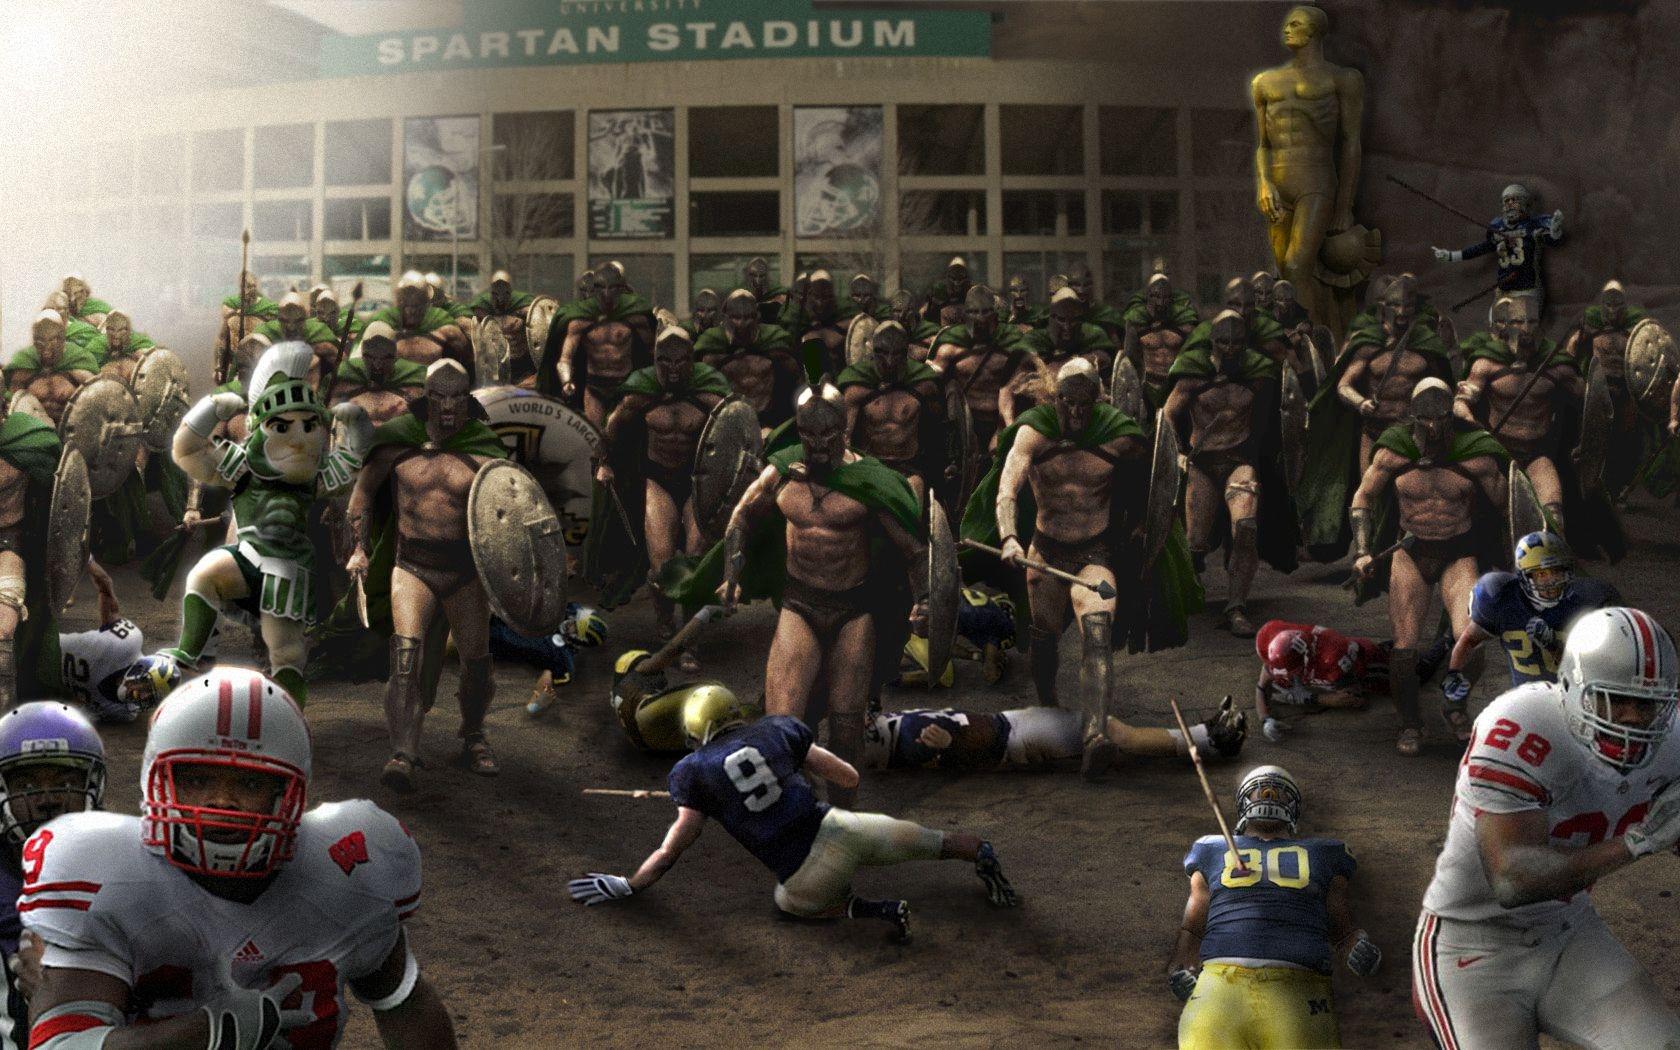 Spartan American Wallpaper 1680x1050 Spartan American Football Big 1680x1050